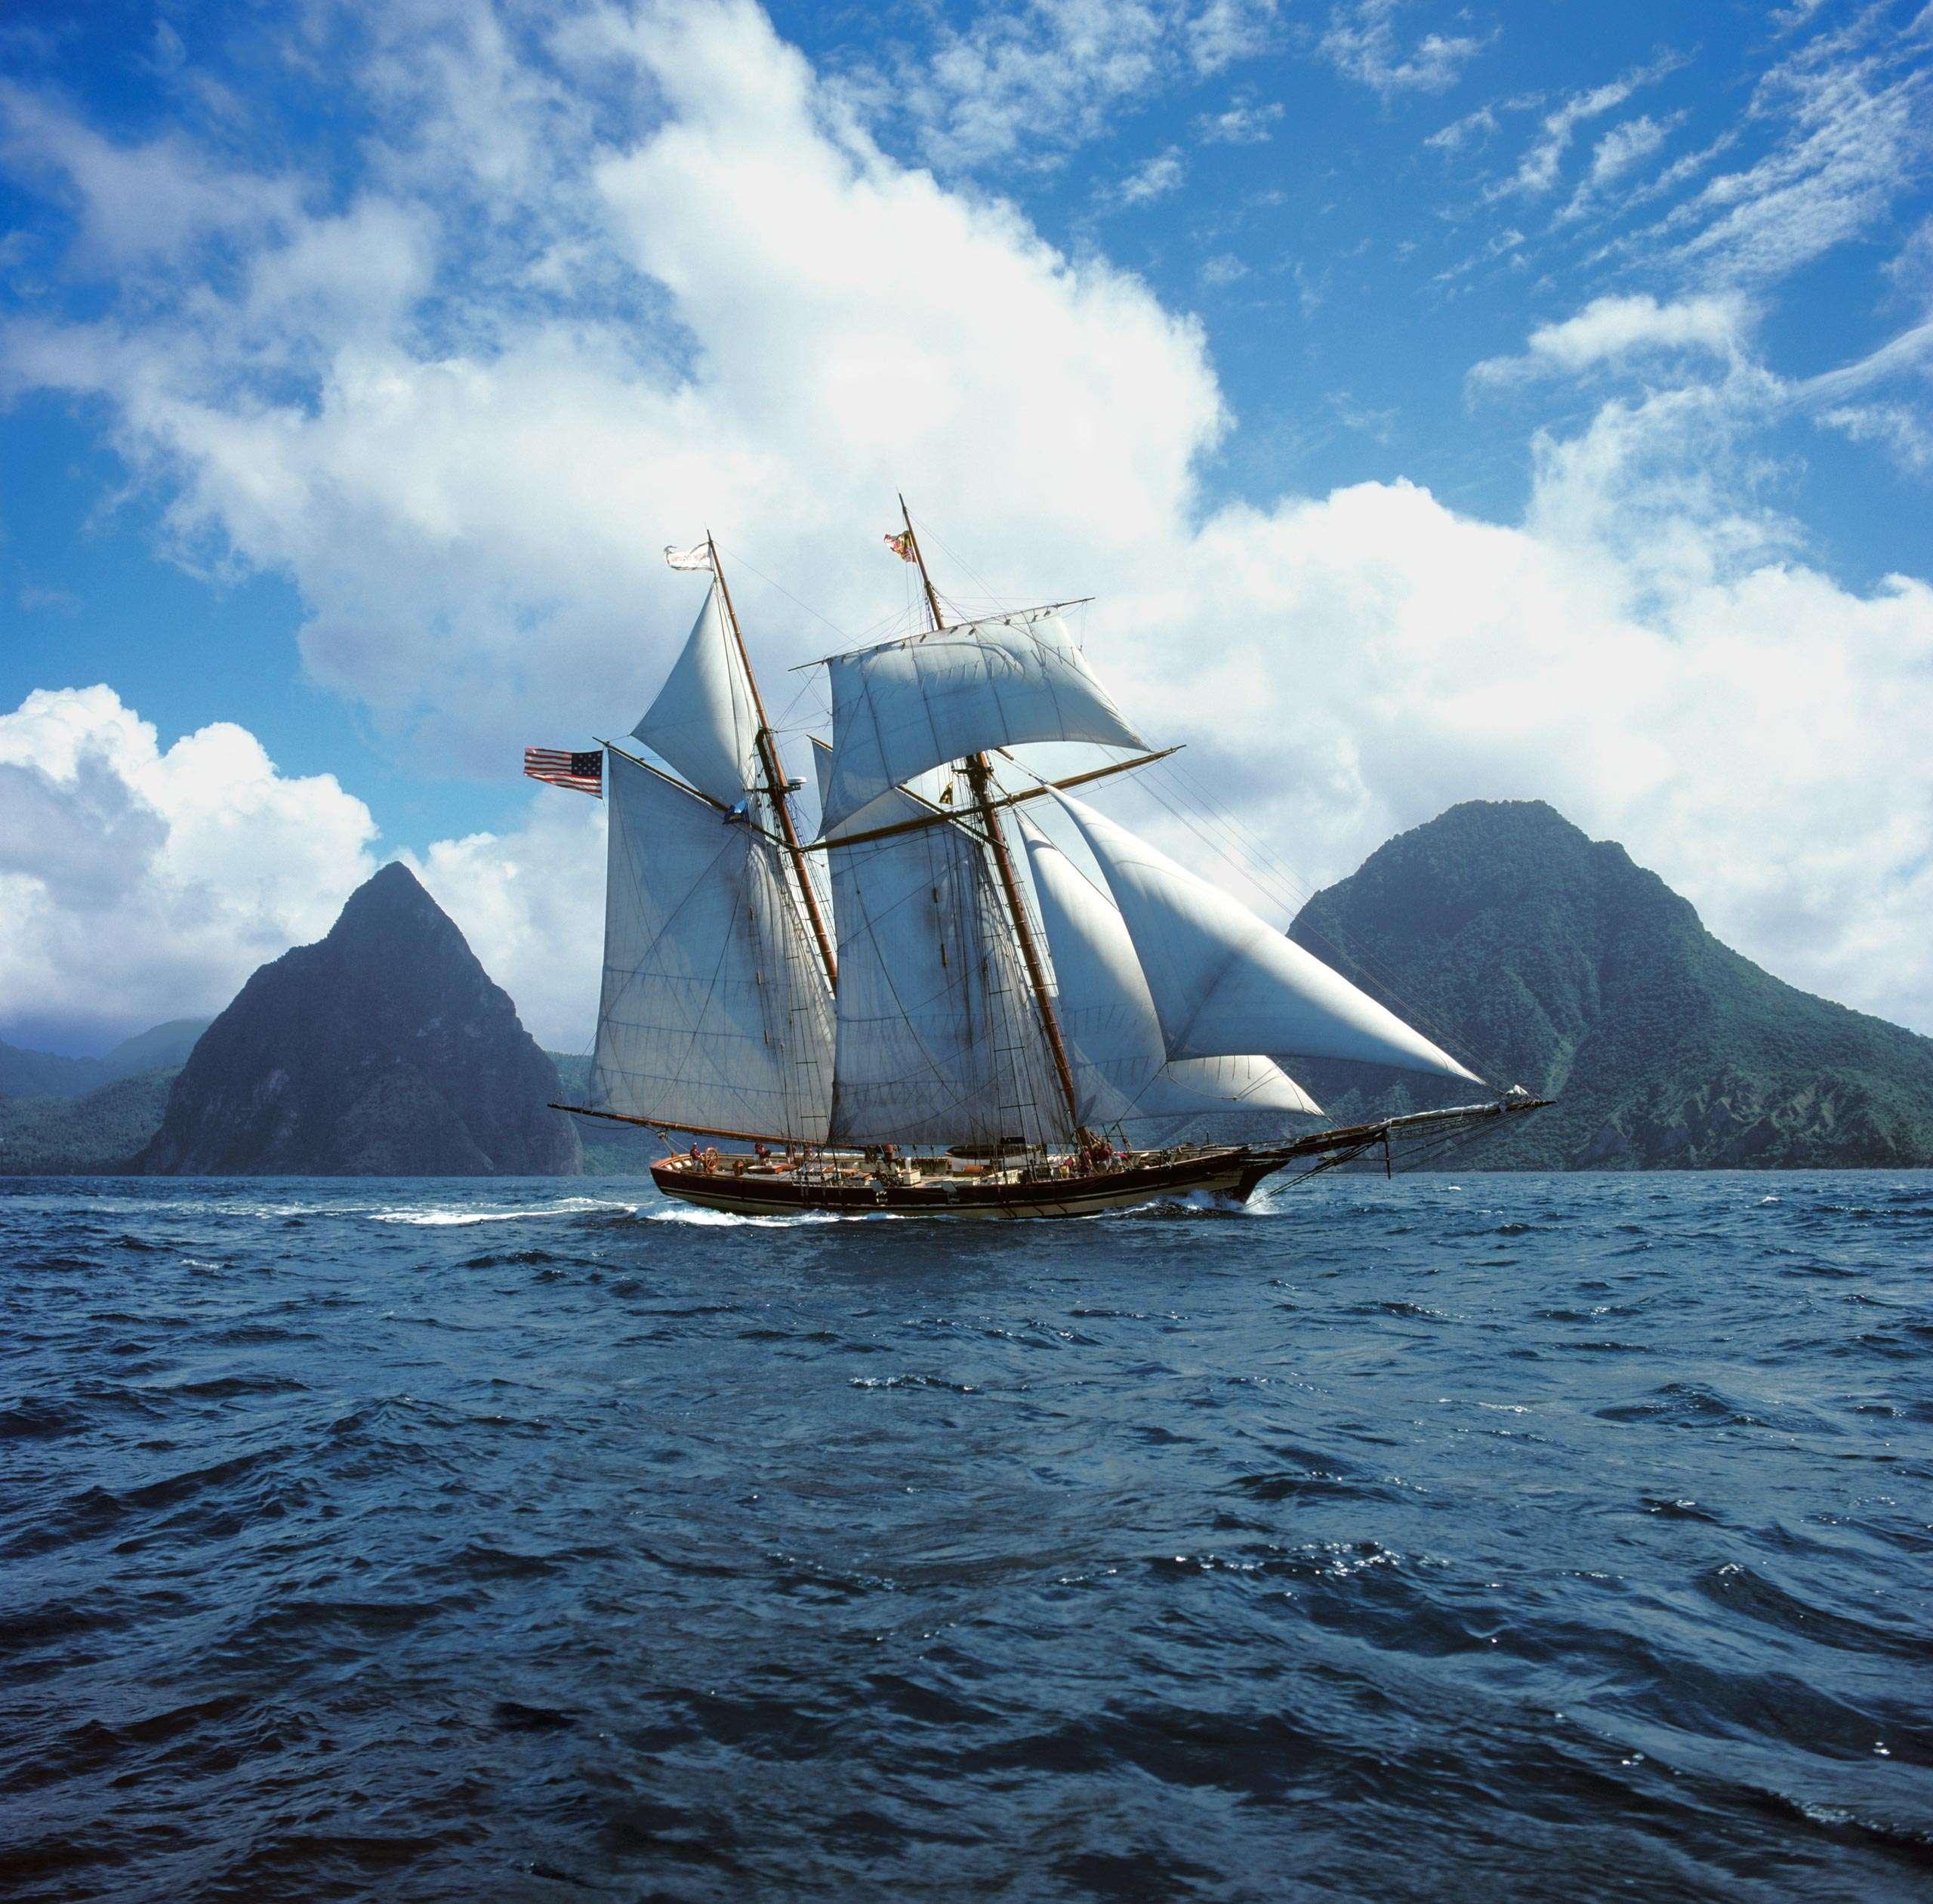 PORTFOLIO - Sailing - Windjammers #21   PCG077